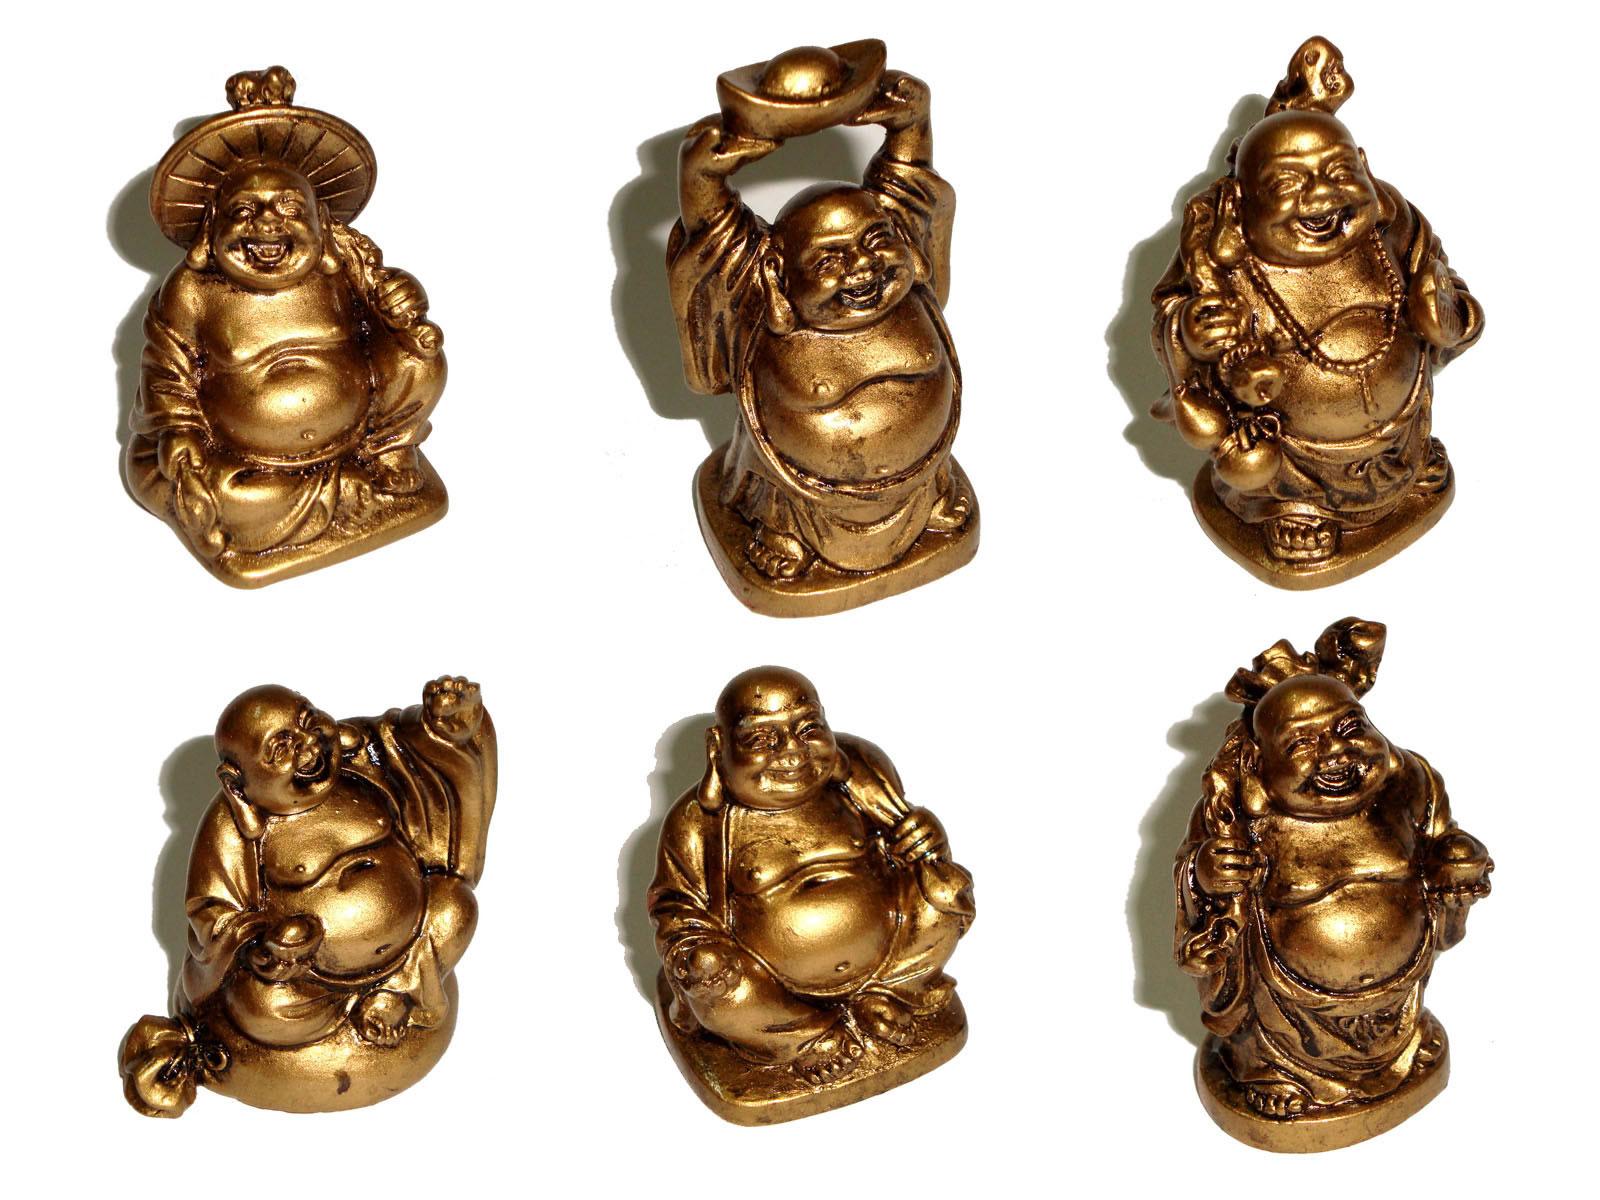 Laughing Buddha Mini Statues Set of 6 - BRONZE